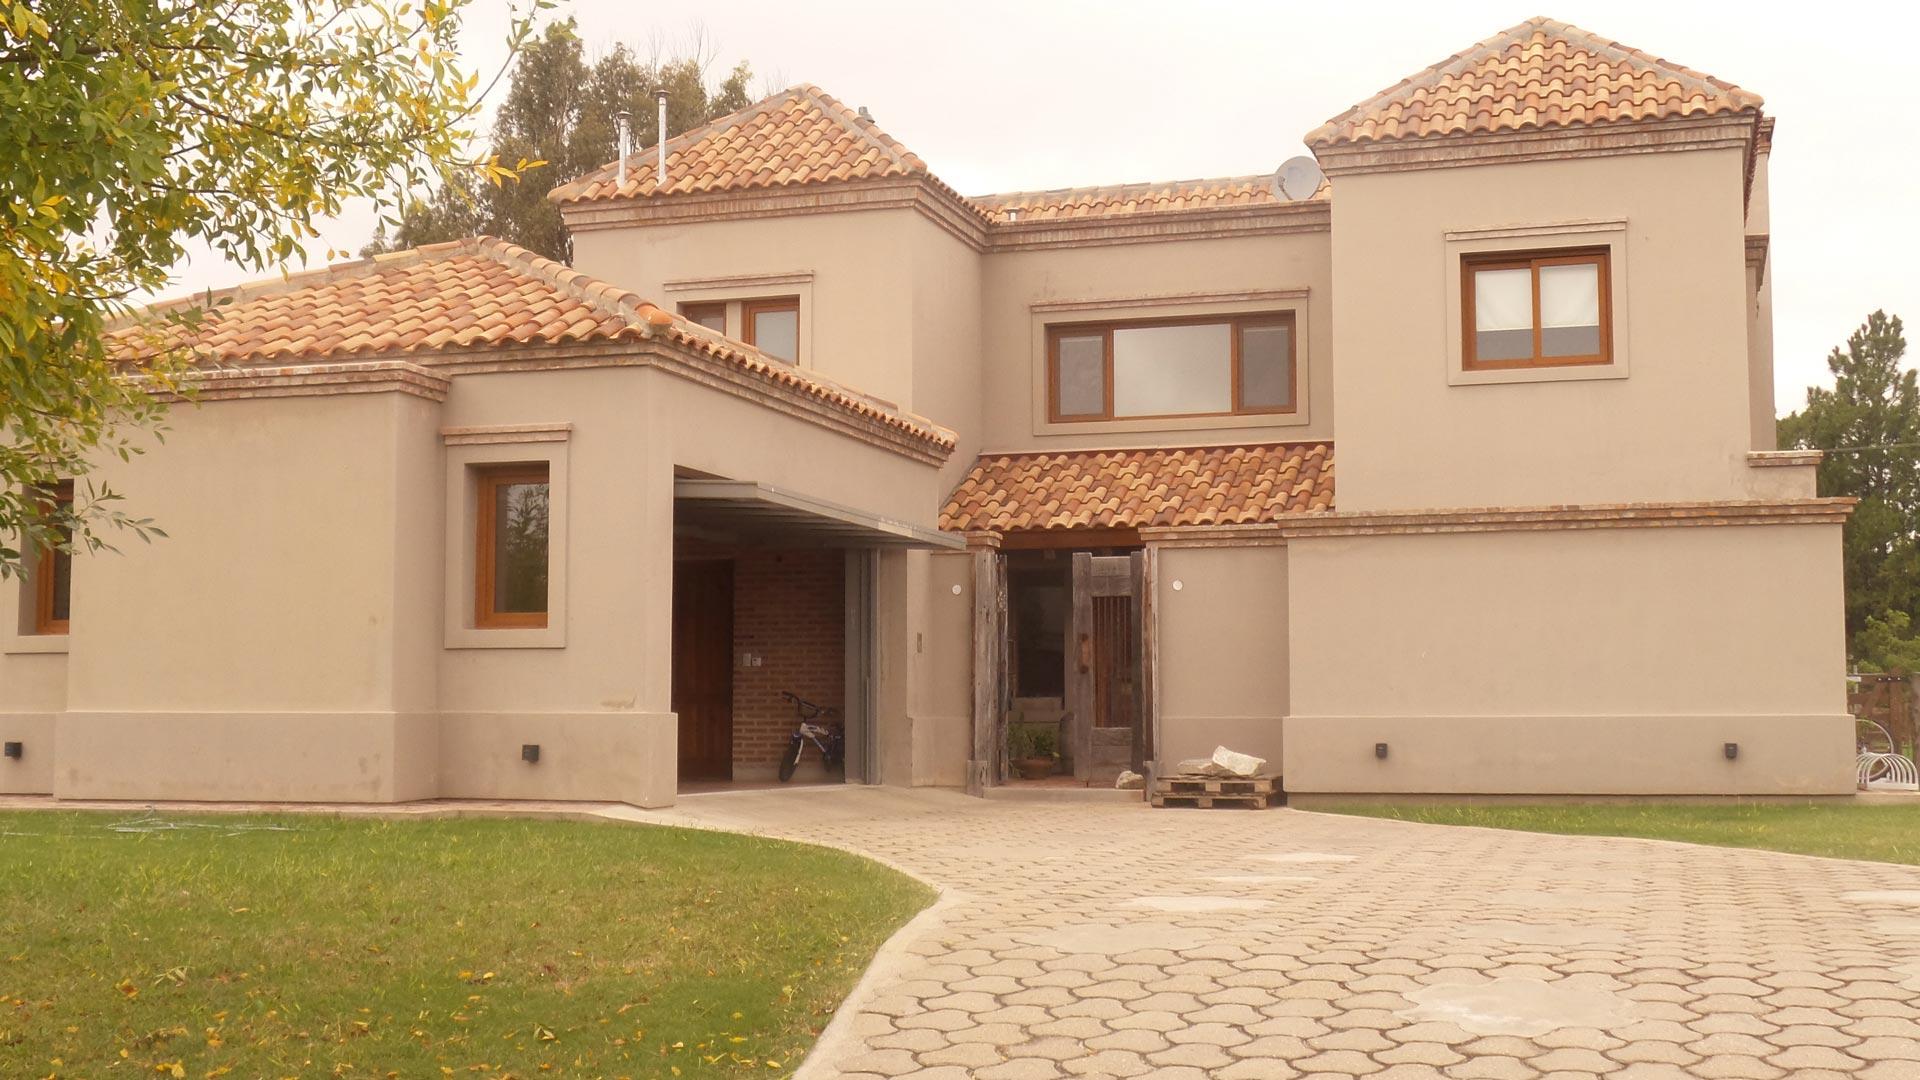 Pinasco arquitectos casa estilo cl sico moderno portal for Casas estilo clasico moderno